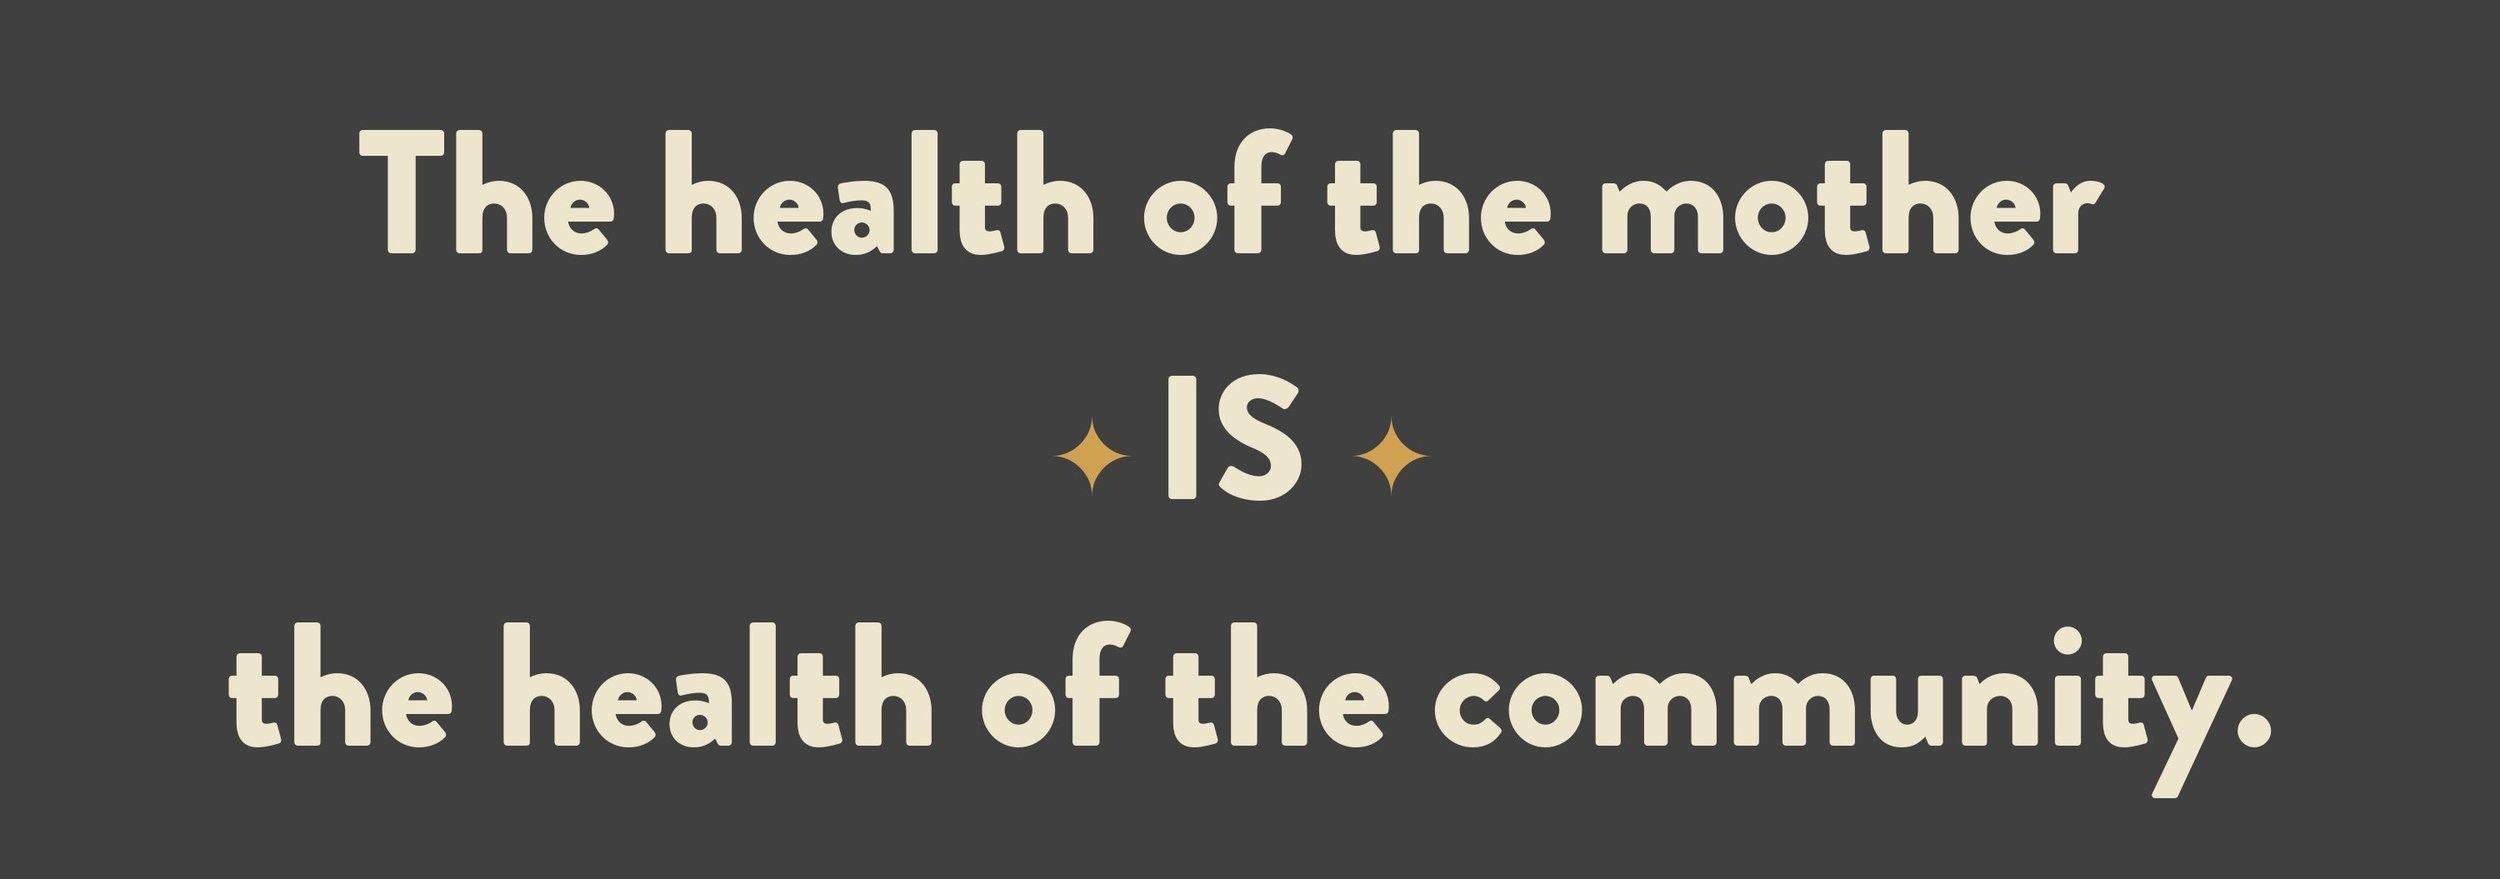 healthymothershealthycommunity.jpg